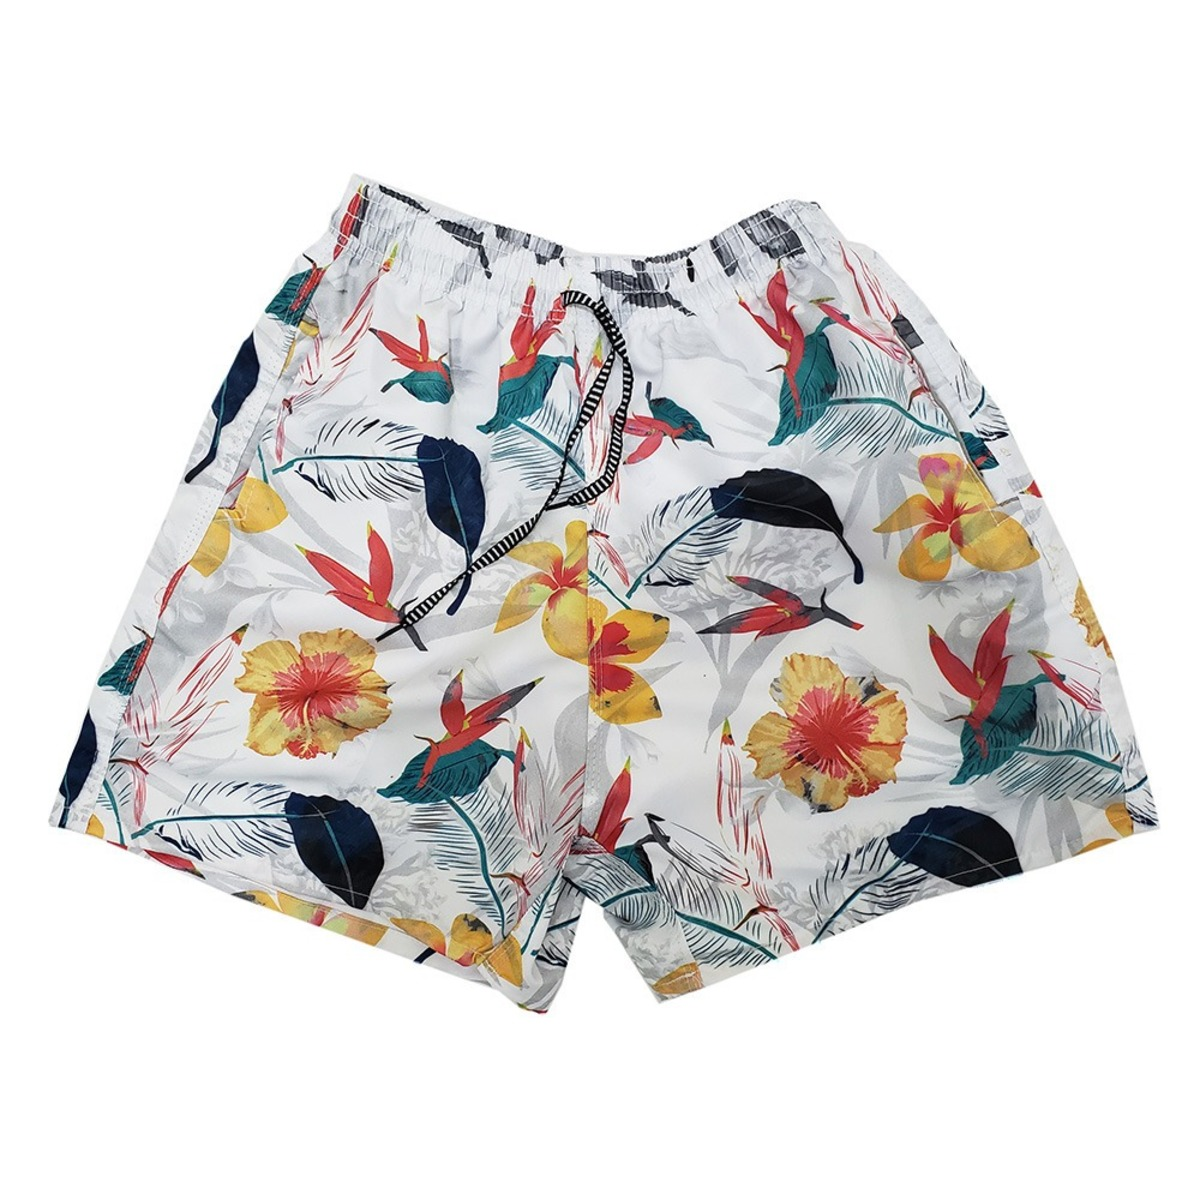 Kit 4 Shorts Mauricinho Bermudas Moda Praia Estilo Neymar